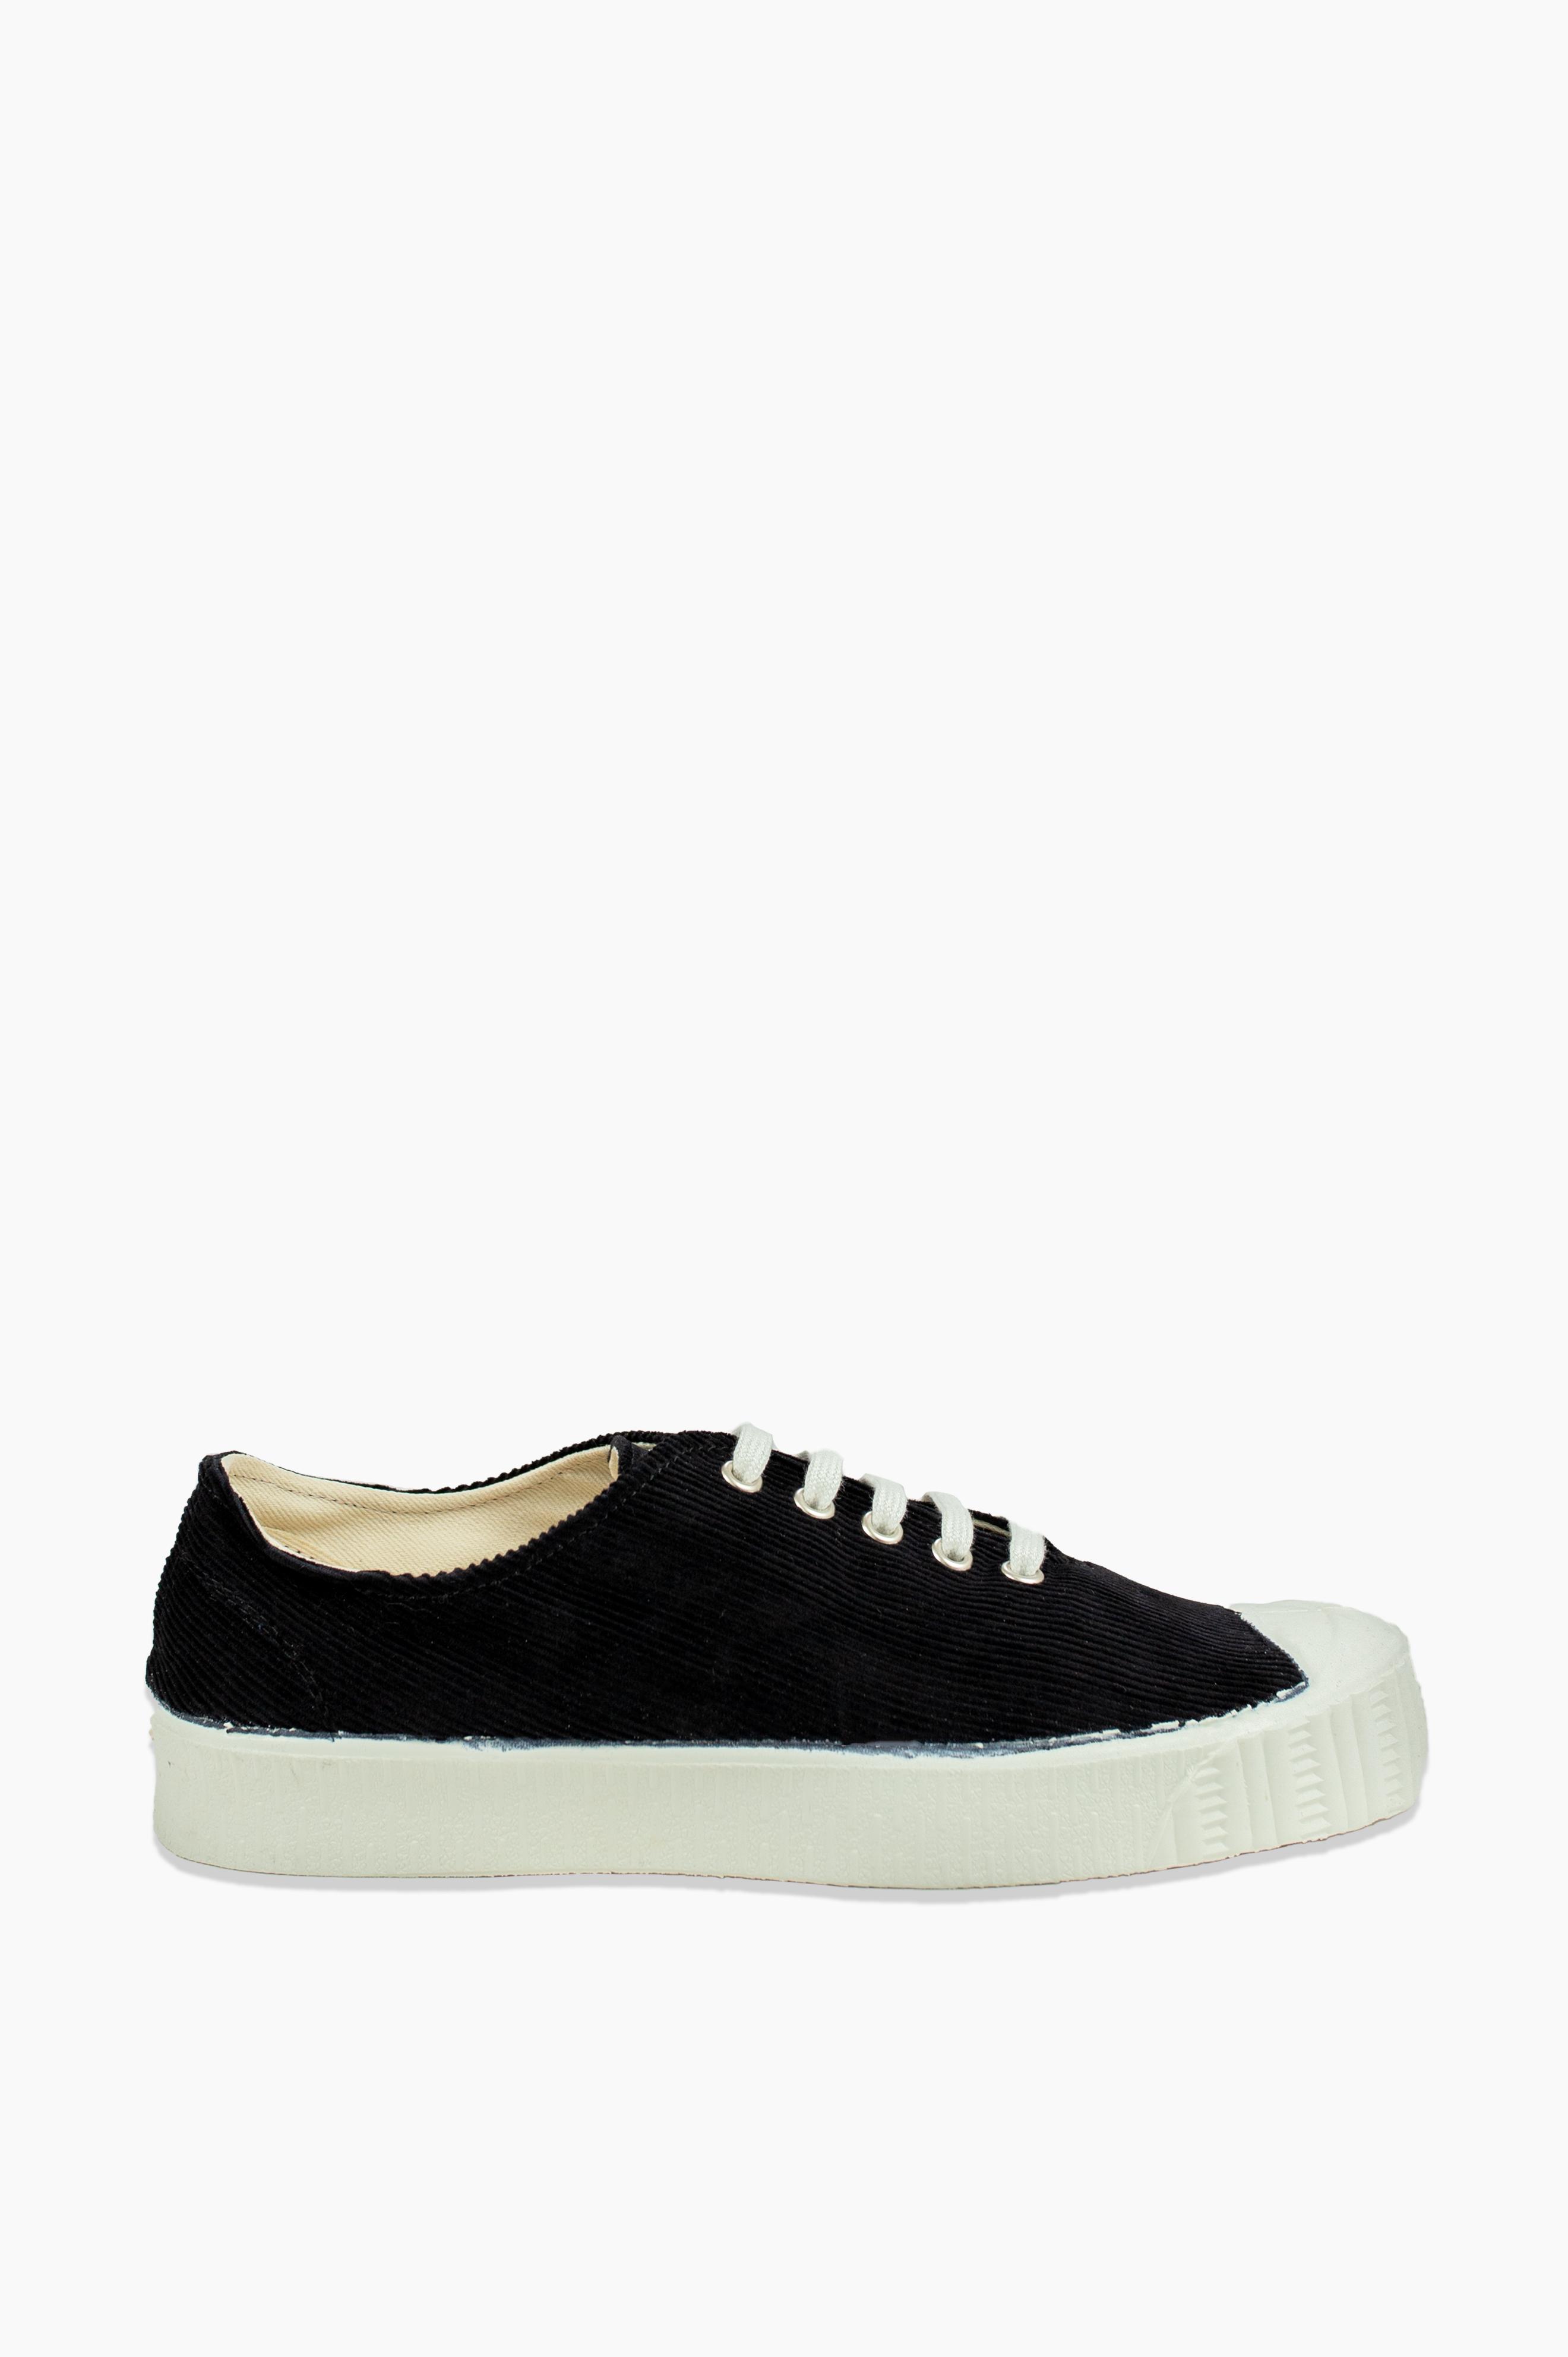 x Spalwart Special V Low Corduroy Sneaker Black